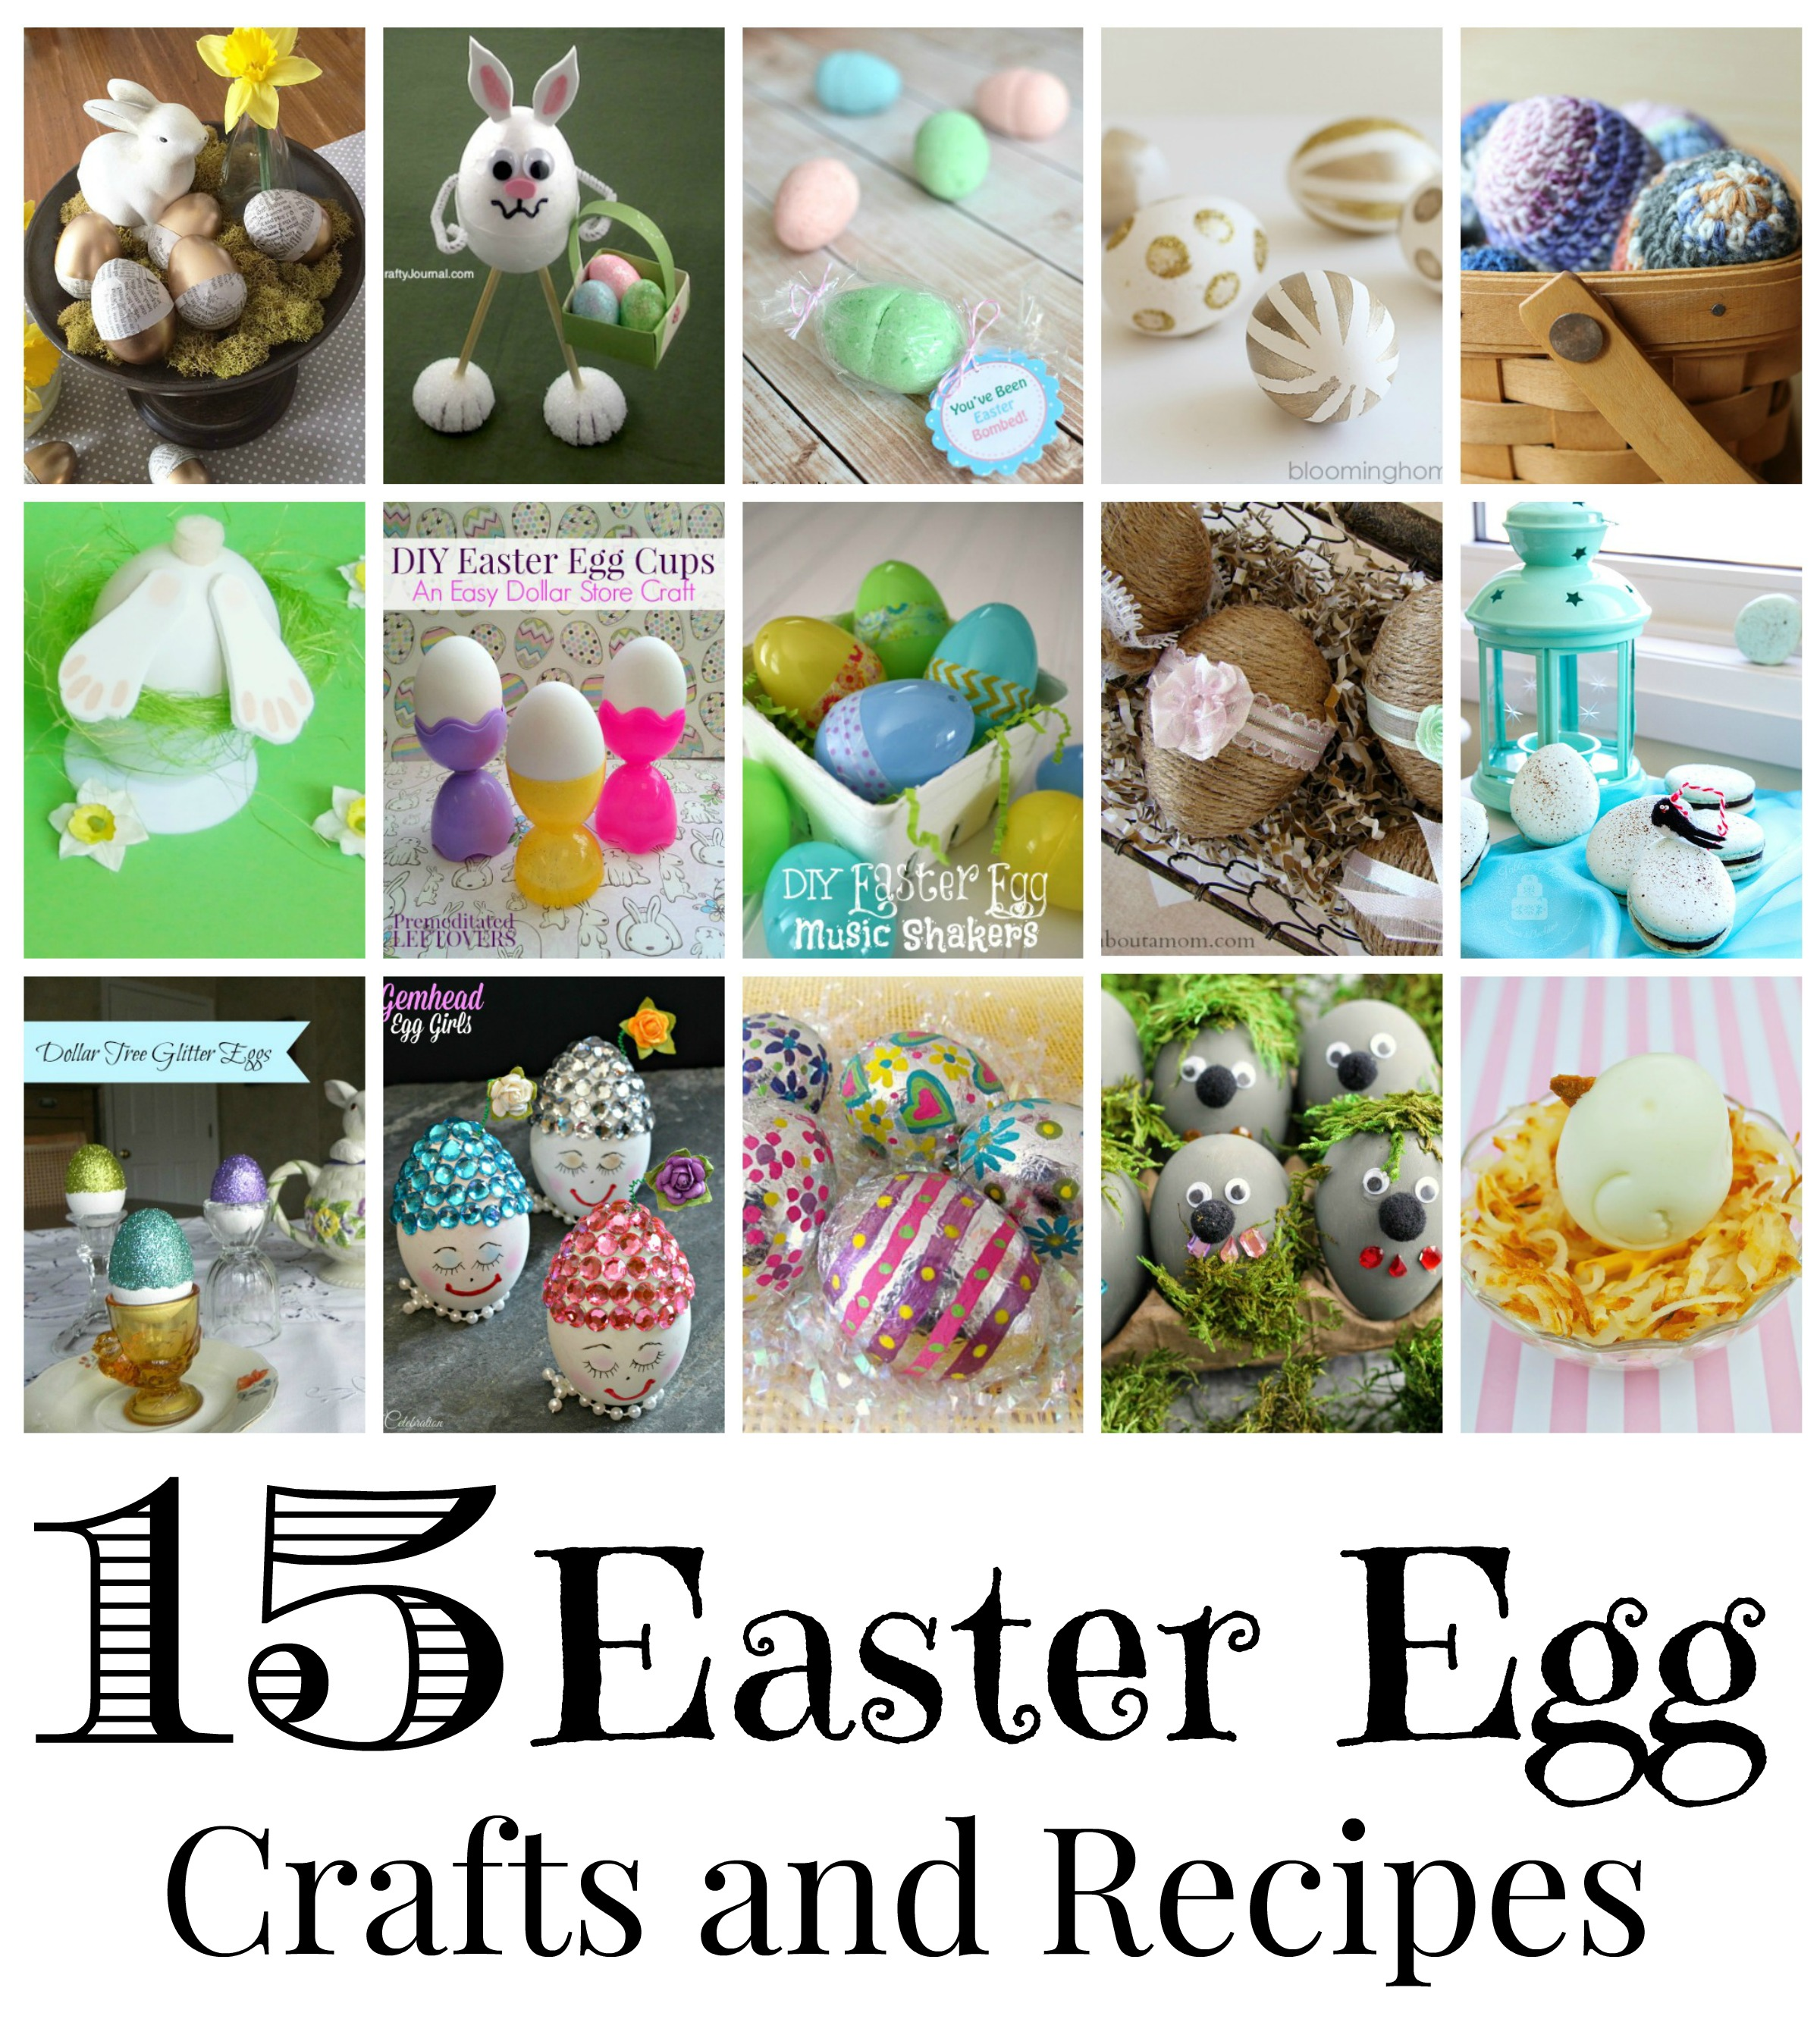 15 Easter Egg Crafts & Recipes